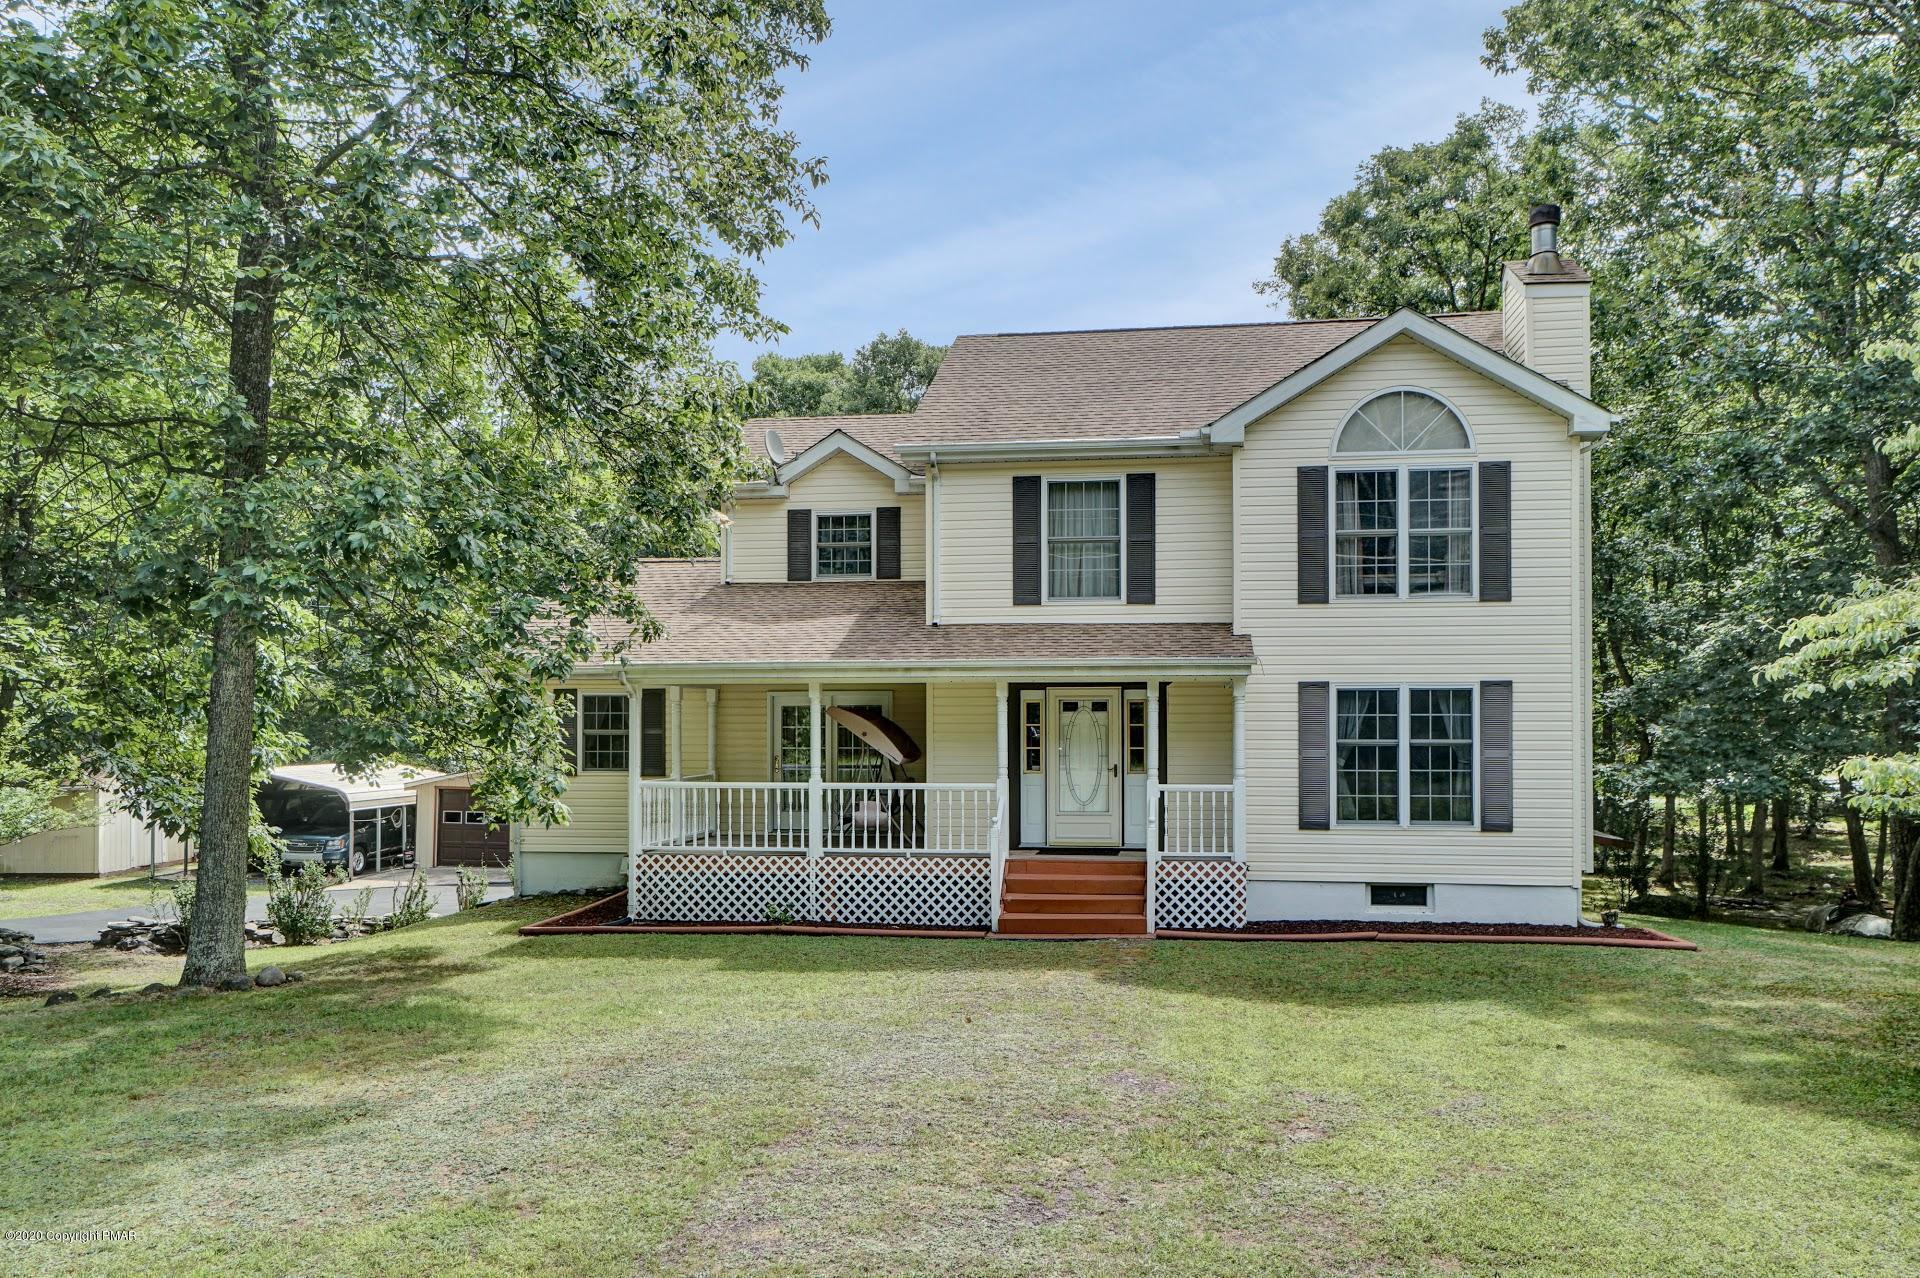 501 Overlook Ln, East Stroudsburg, PA 18302